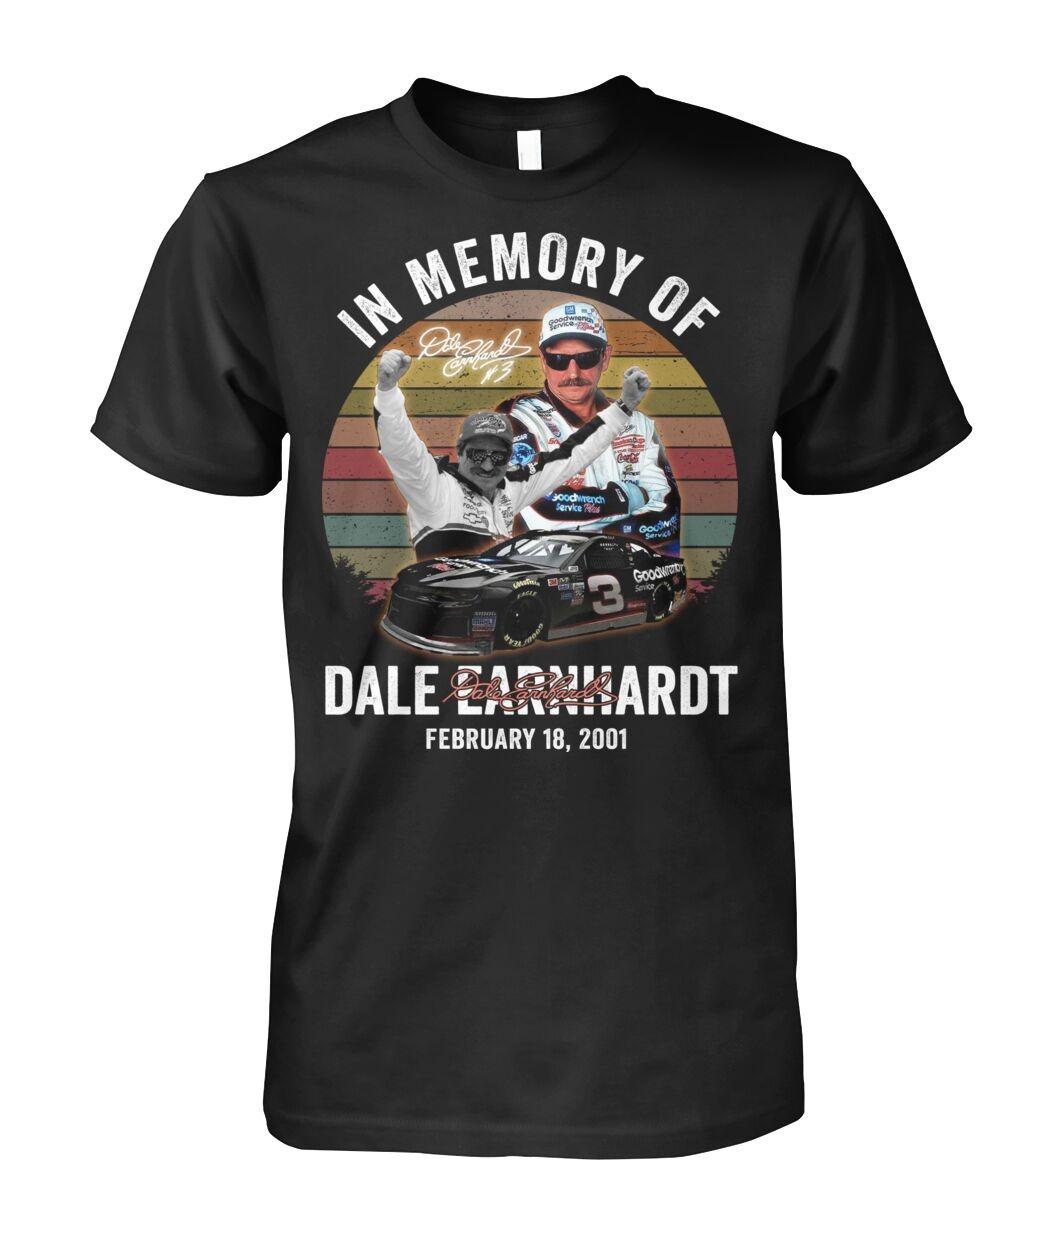 In Memory Of Dale Earnhardt February 18 2001 T-Shirt